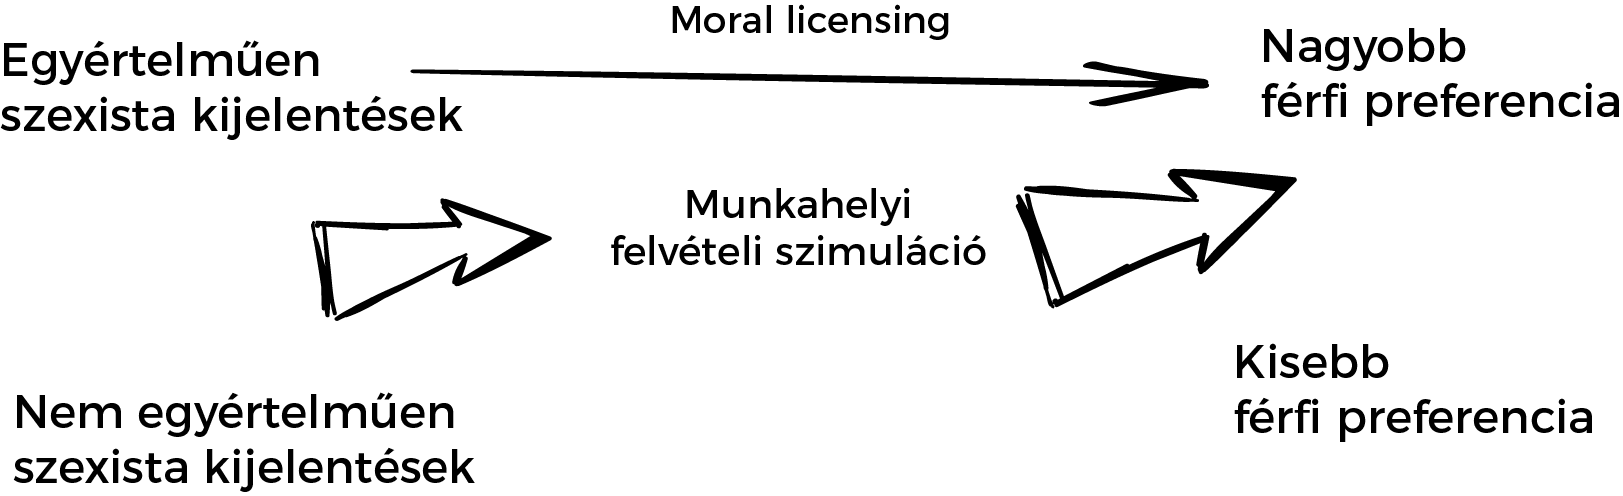 moral_licensing.png